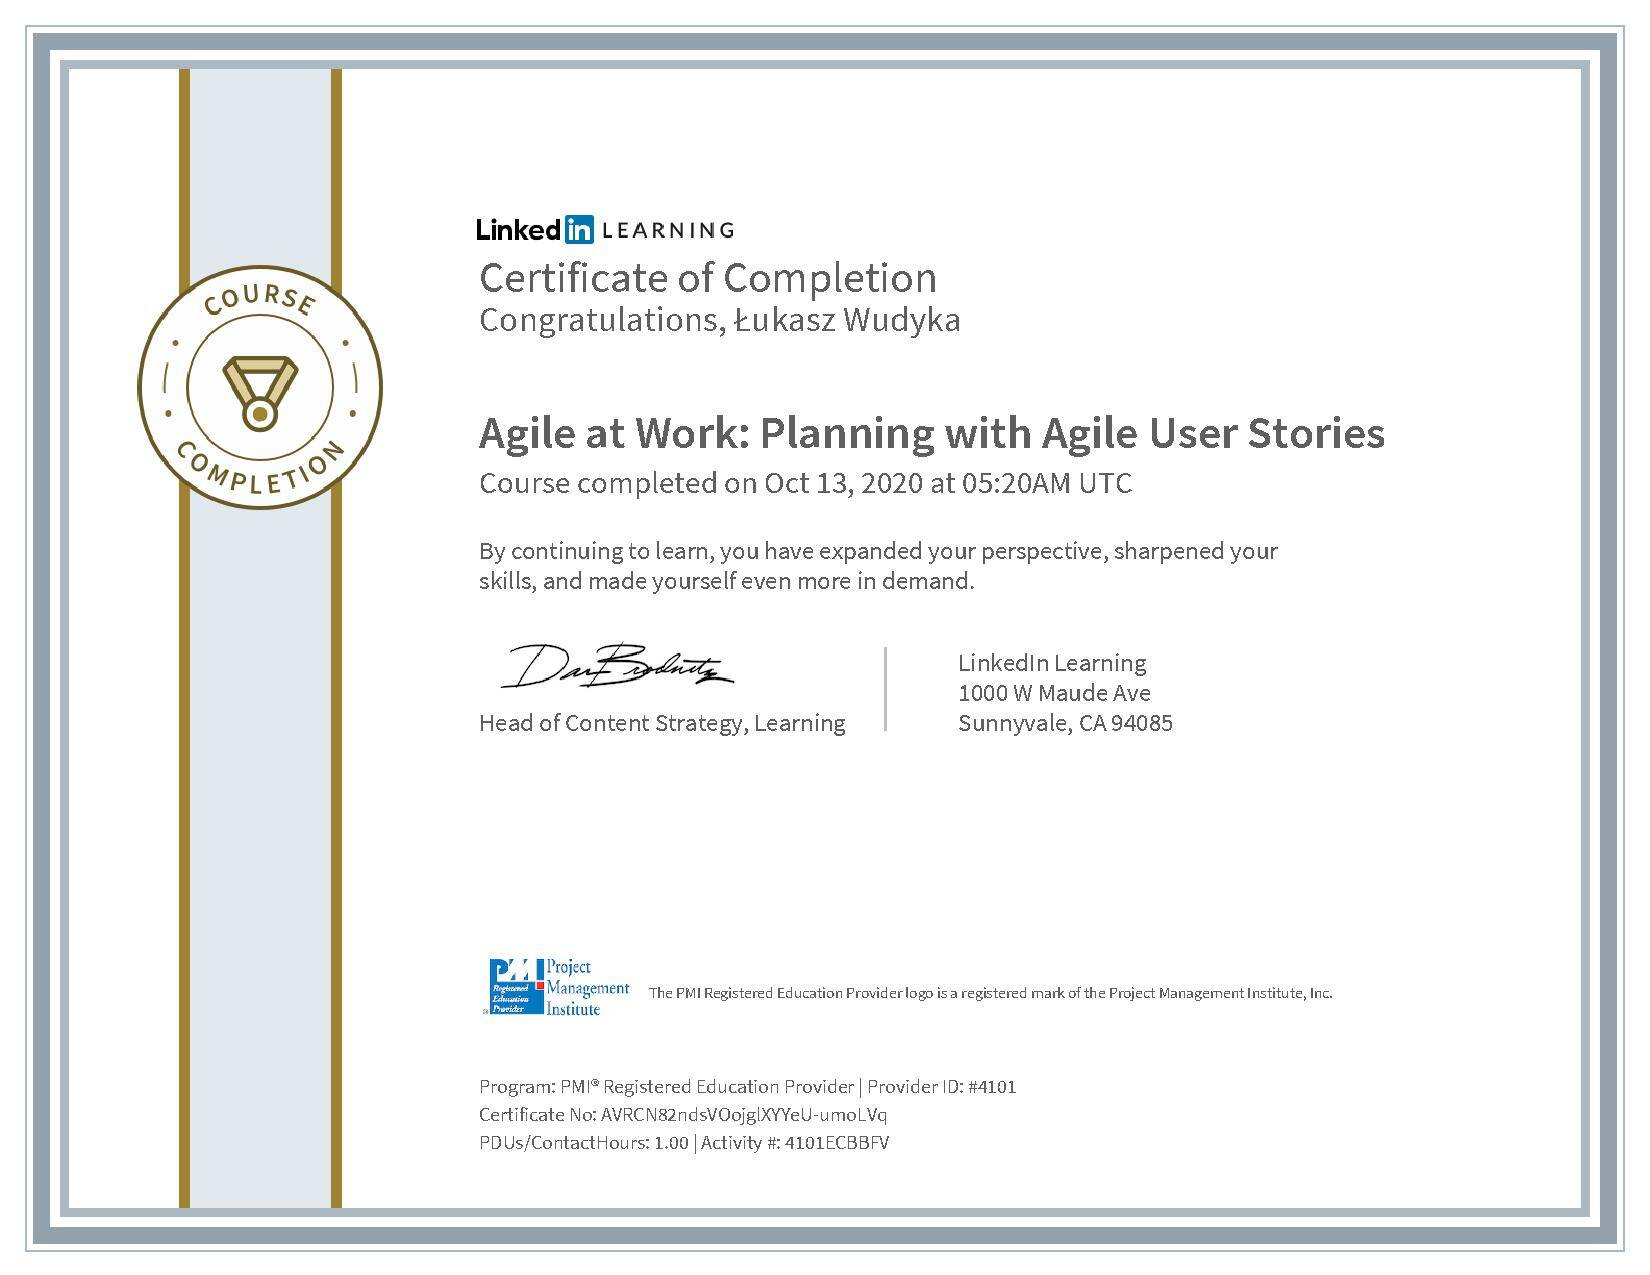 Łukasz Wudyka certyfikat LinkedIn Agile at Work: Planning with Agile User Stories PMI